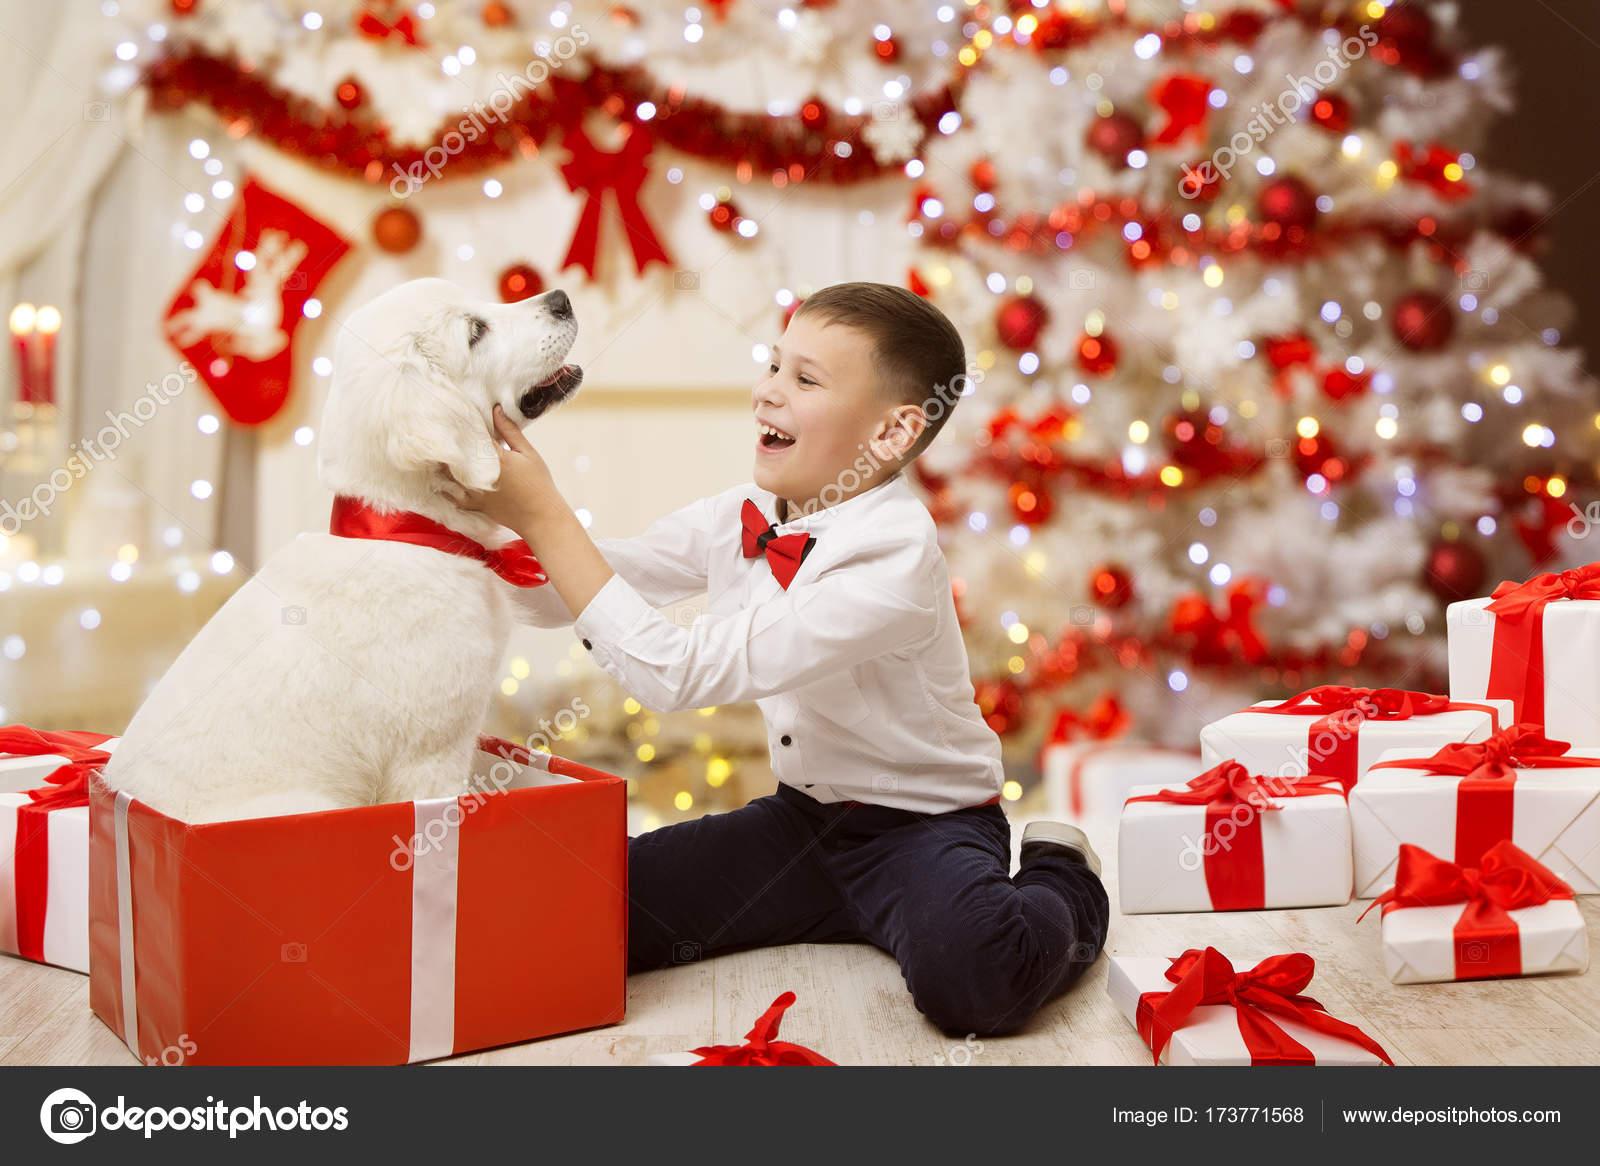 Child Getting Christmas Dog Puppy Present Happy Kid Boy Xmas Tree Stock Photo C Inarik 173771568